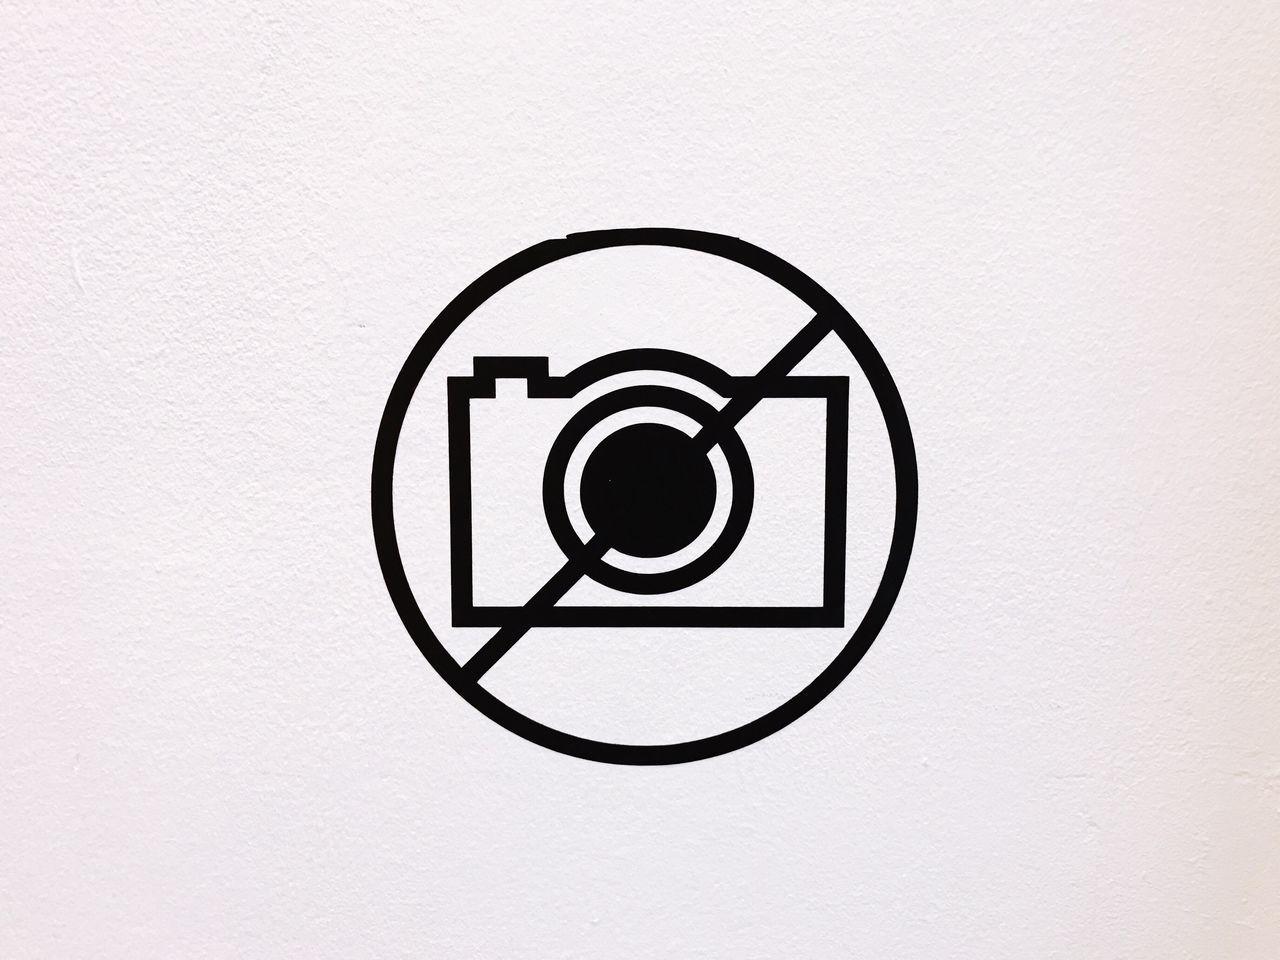 Close-up No Photo Logo Photography